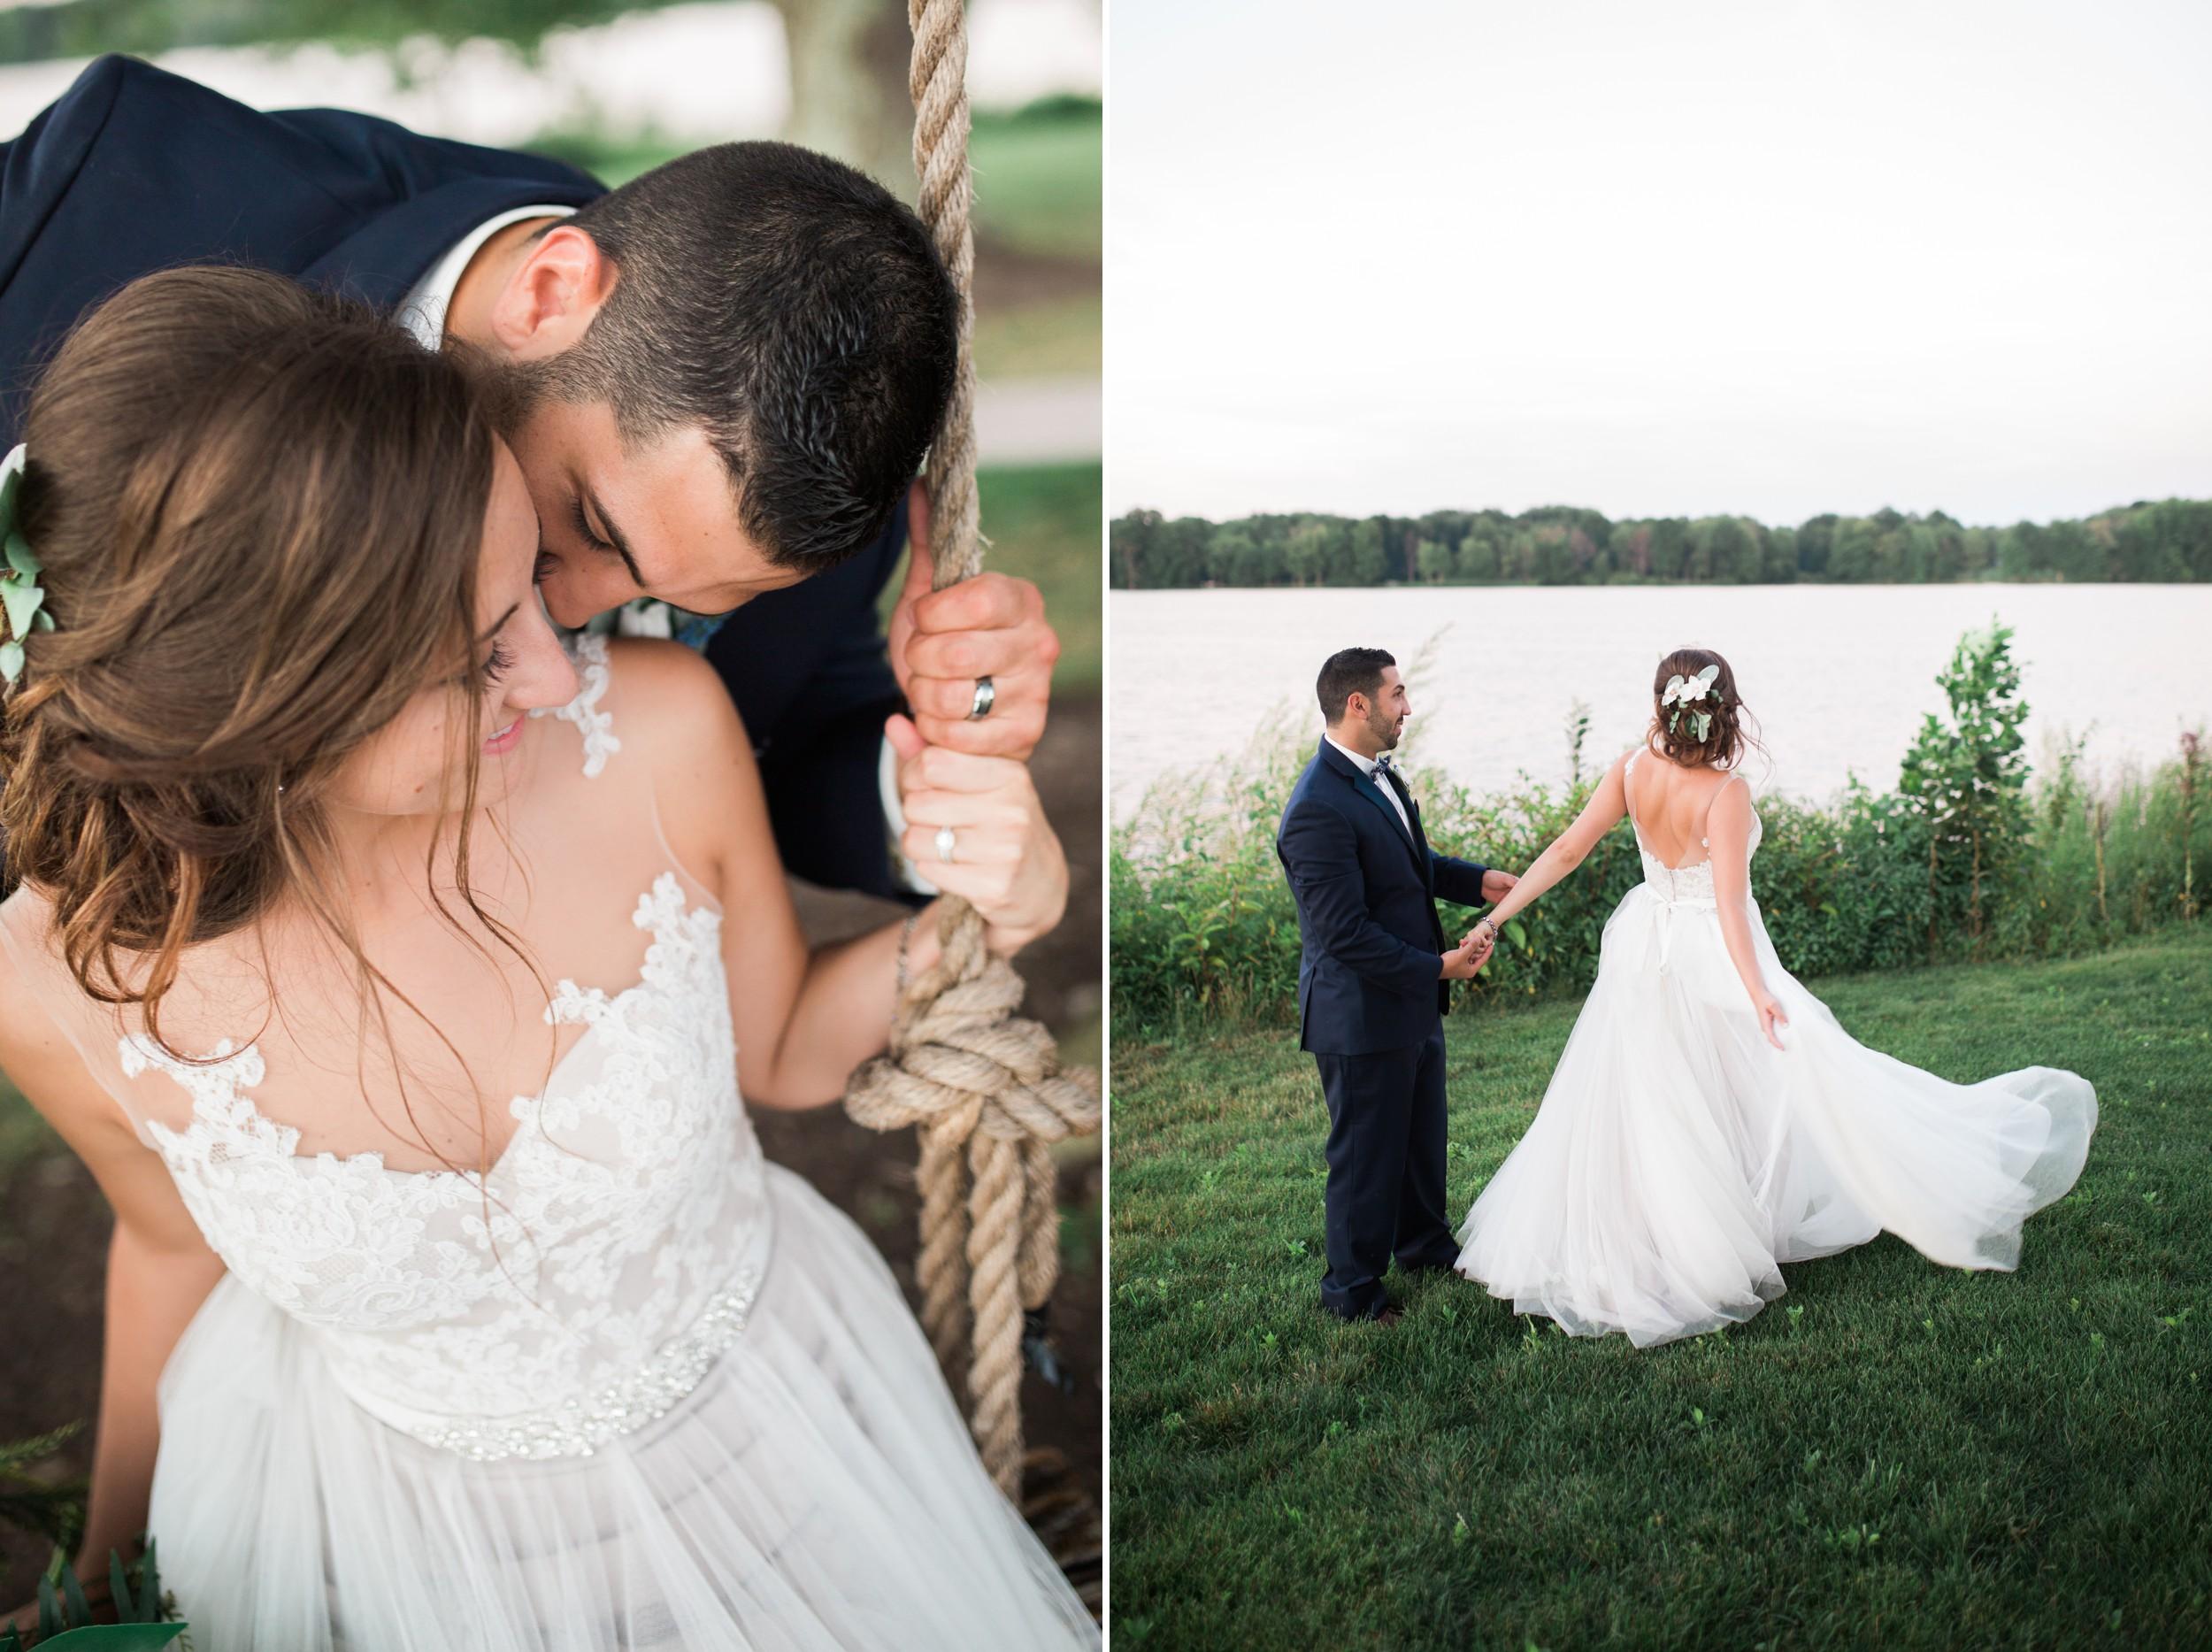 Nick-and-martina-pinelake-vinyards-wedding-columbiana-ohio-tracylynn-photography 31.jpg